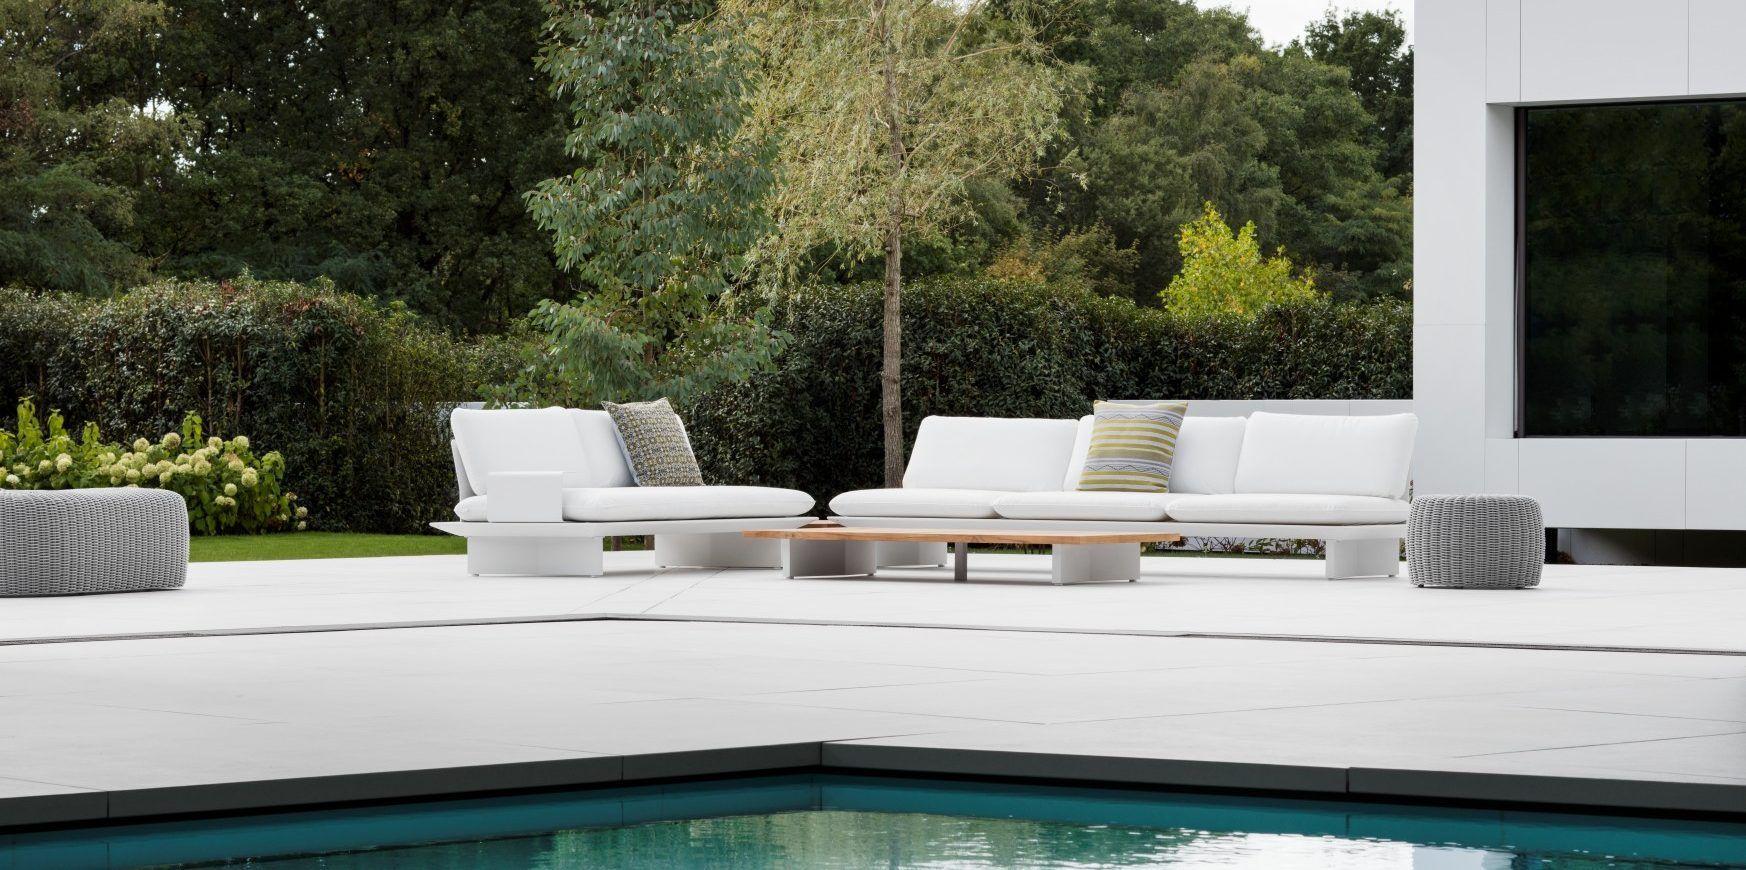 Statement Collection Living Room Jardin De Ville Outdoor Furniture Outdoor Furniture Sets Outdoor Decor Trending Decor